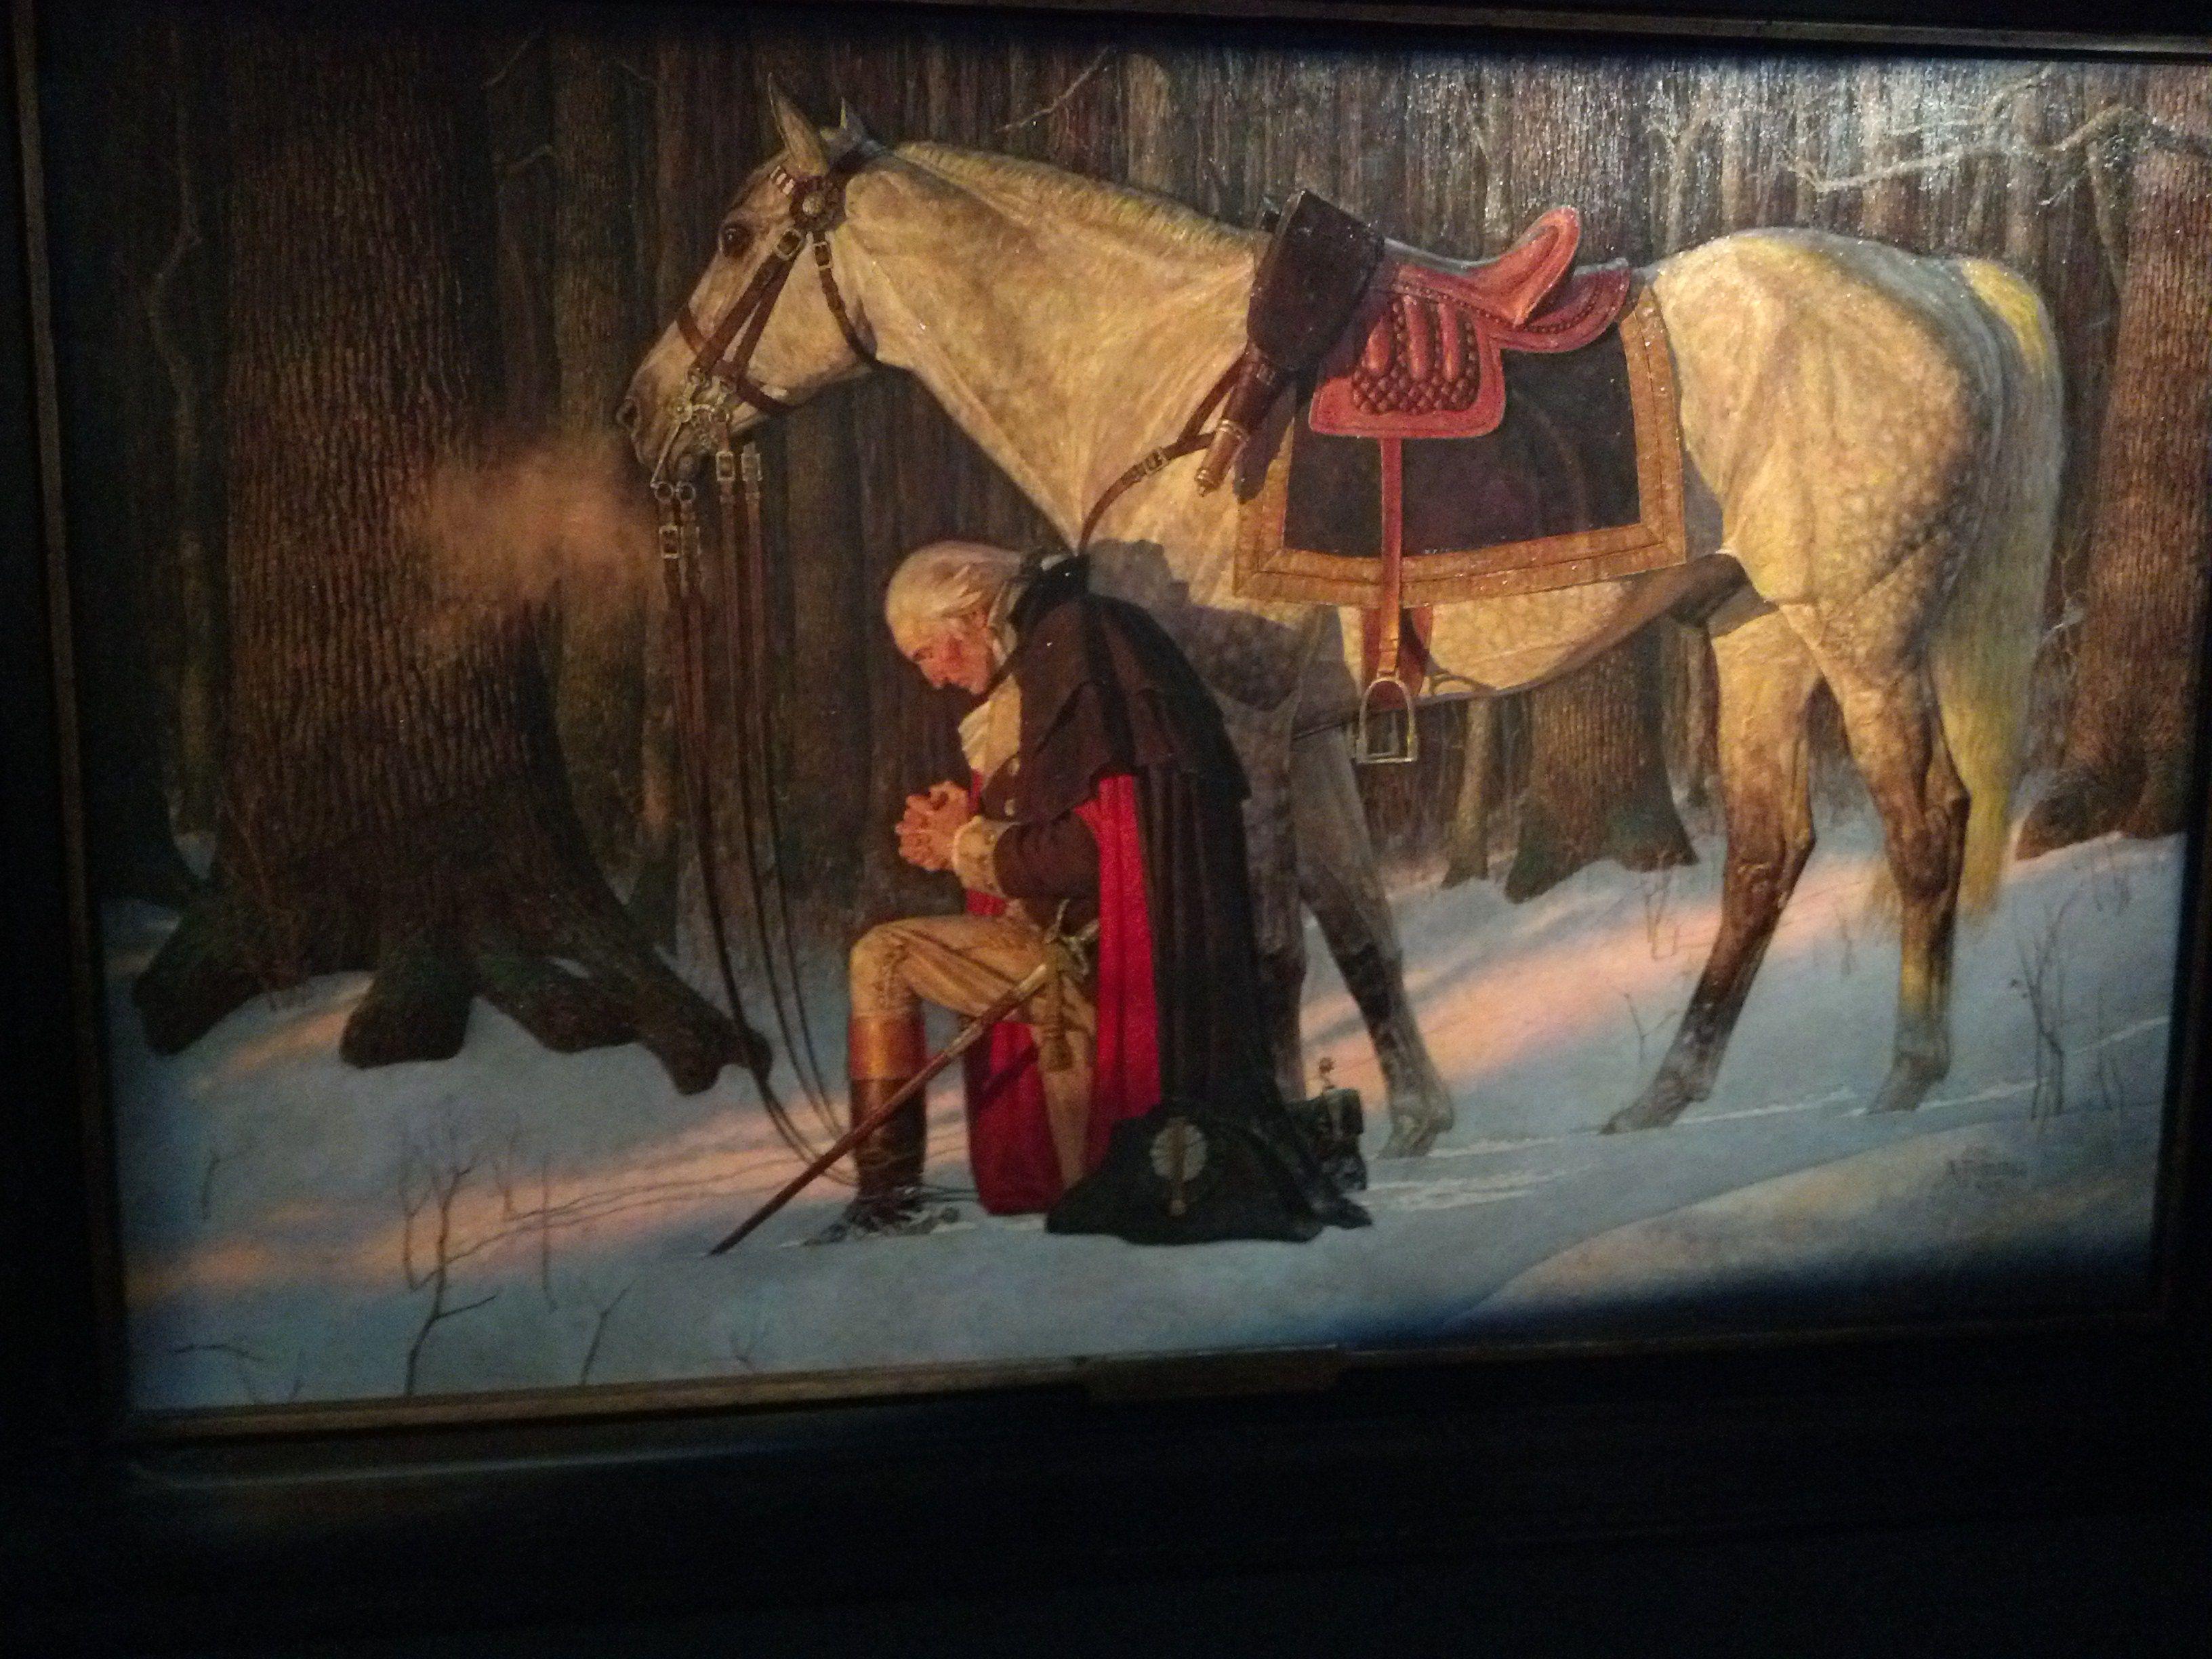 George Washington Prayer at Valley Forge 16 x 20